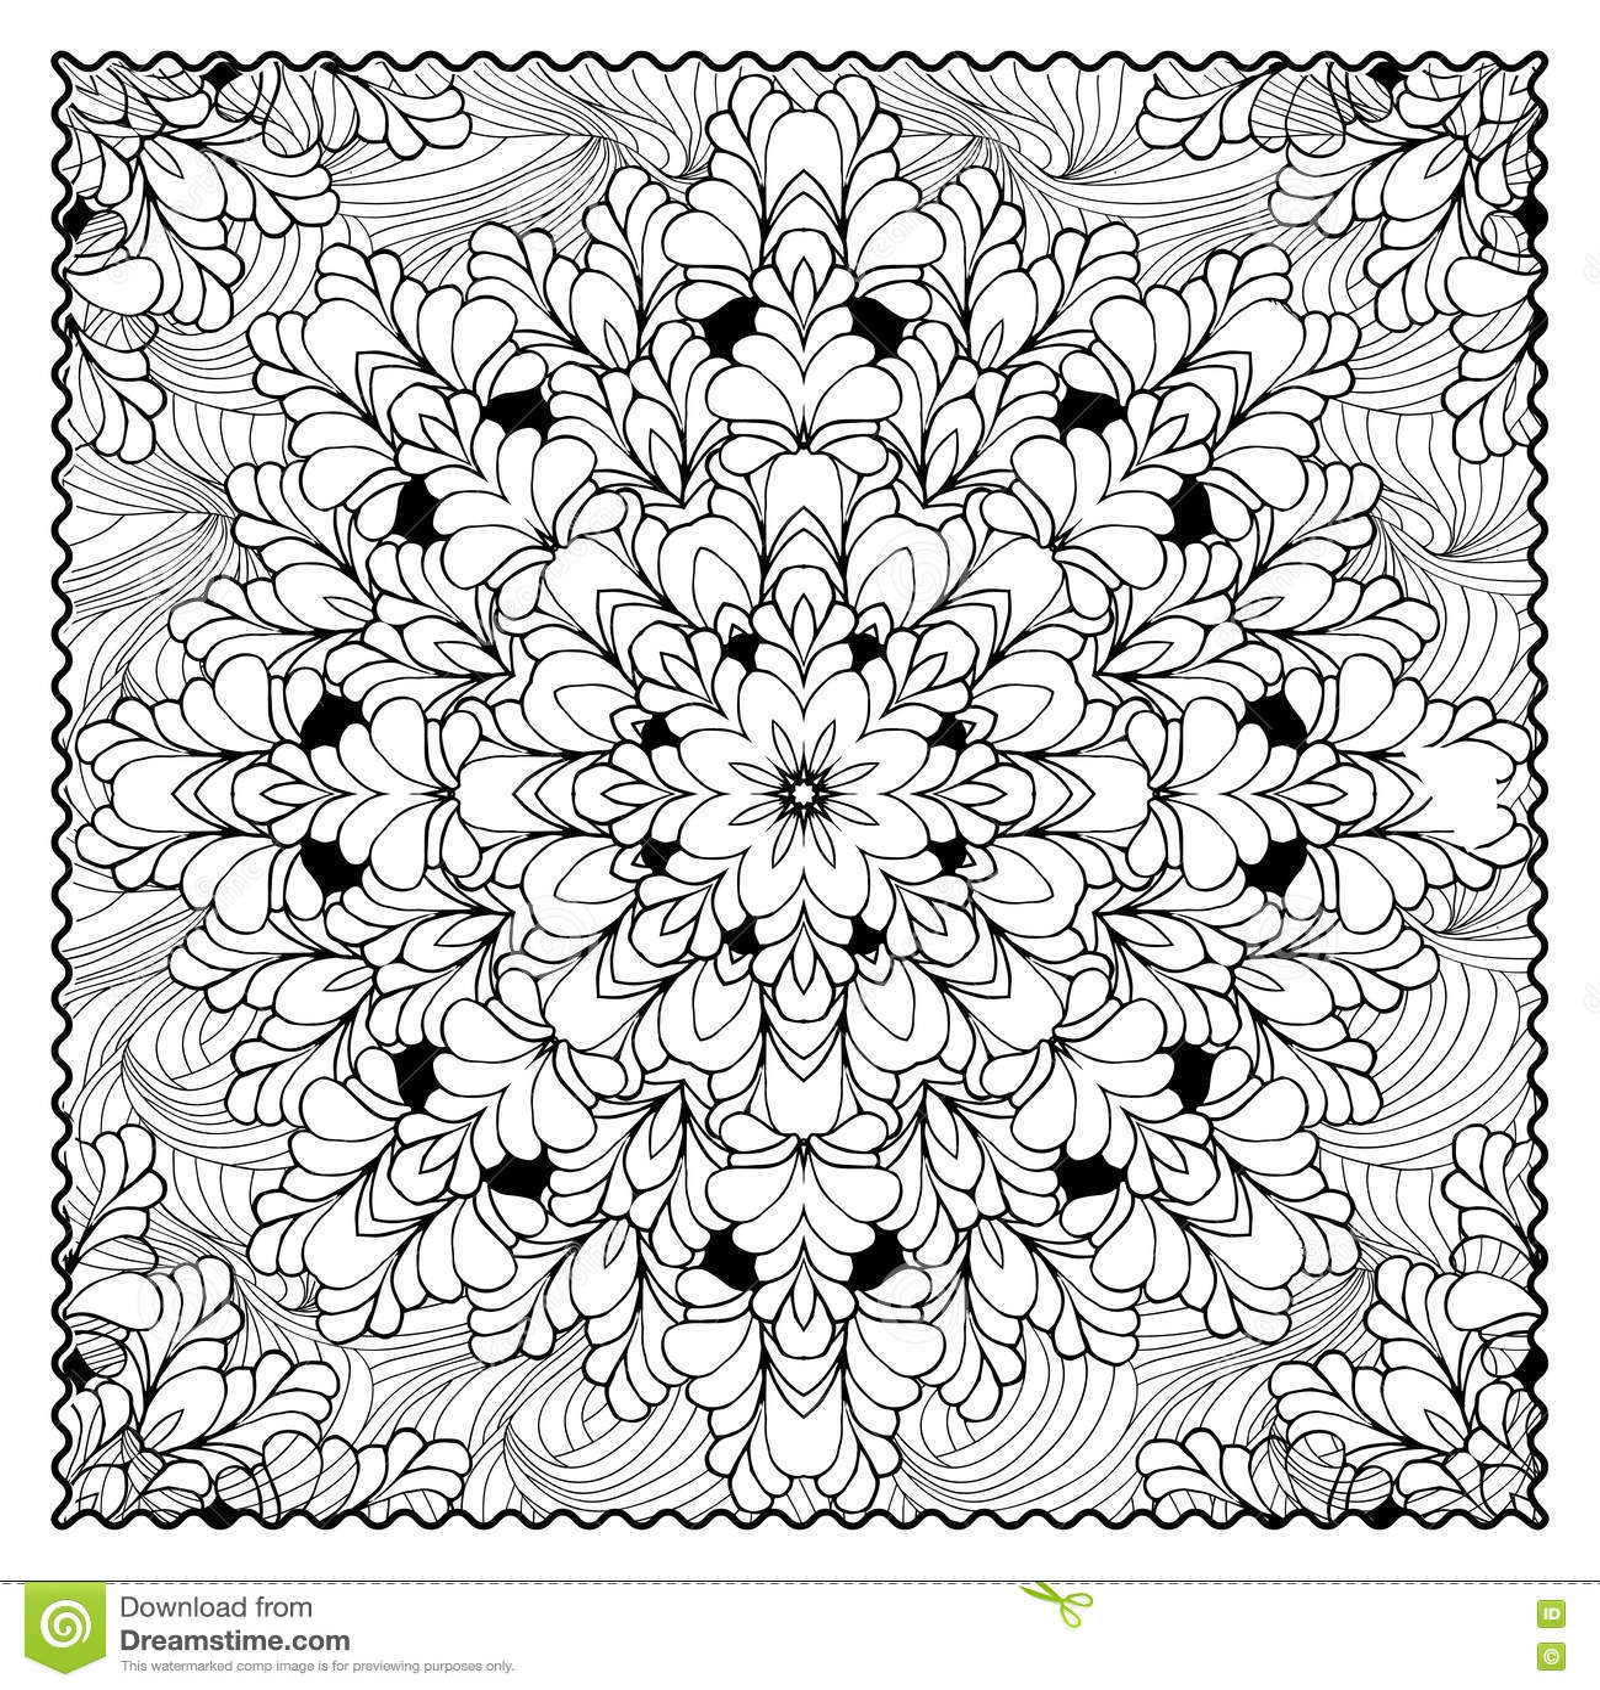 Fantastic Paper Border Designs Templates Image - Resume Ideas ...